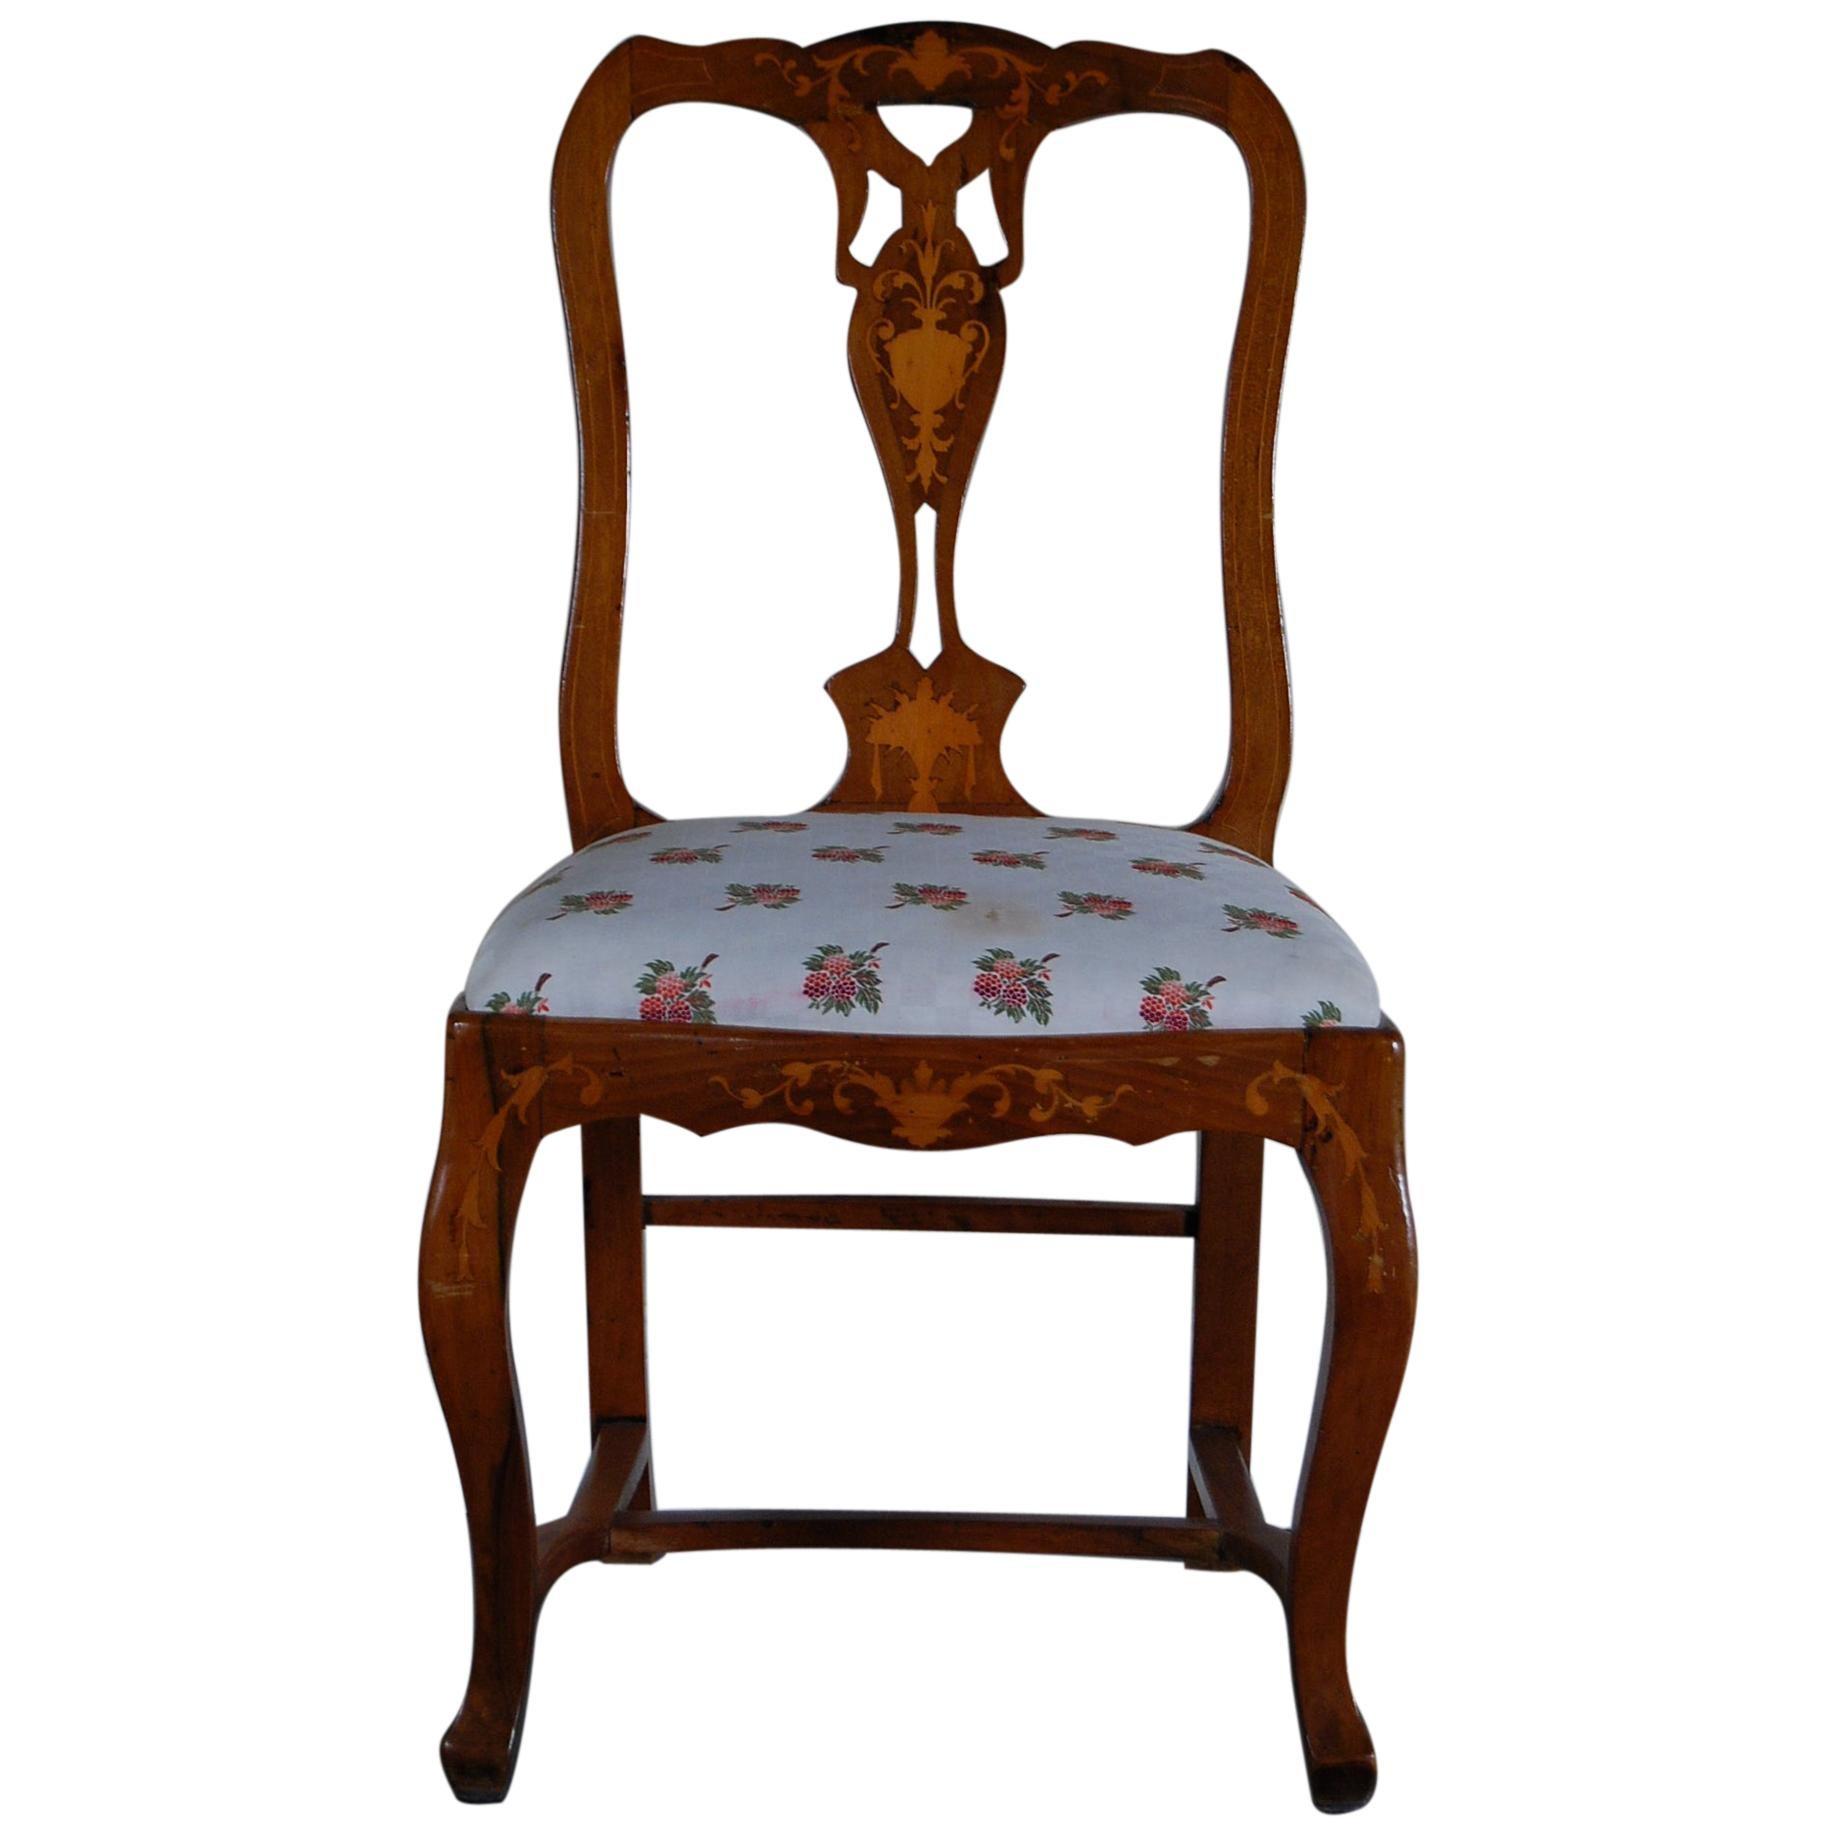 Continental Fruitwood Inlaid Side Chair, circa 1890